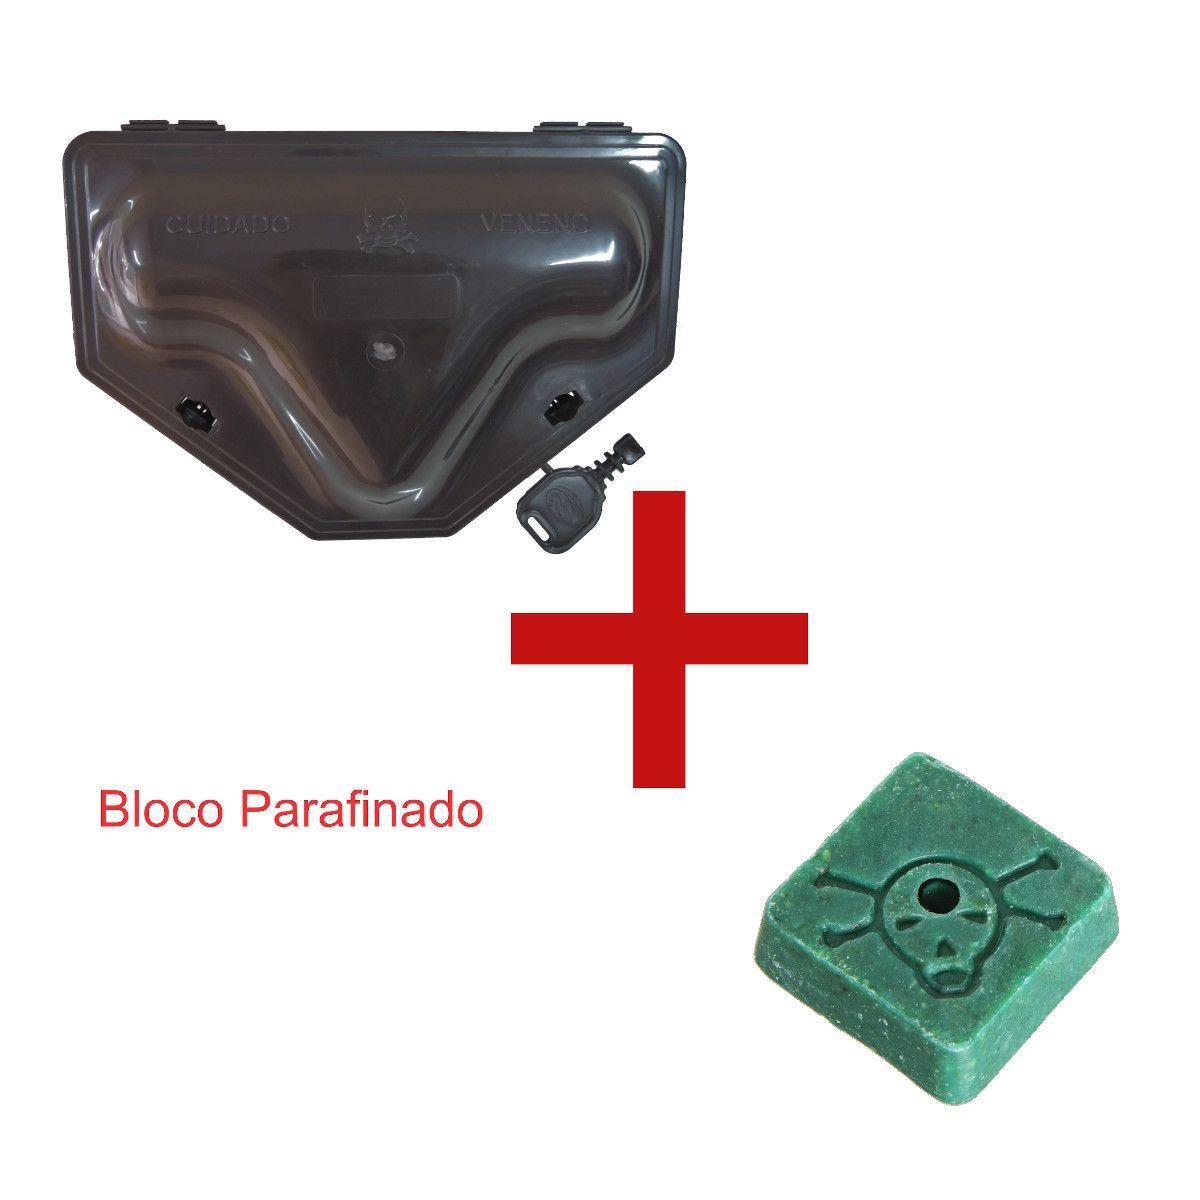 KIT 45 Porta Iscas Reforçado Ratoeira 2 TRAVAS Chave p/Ratos